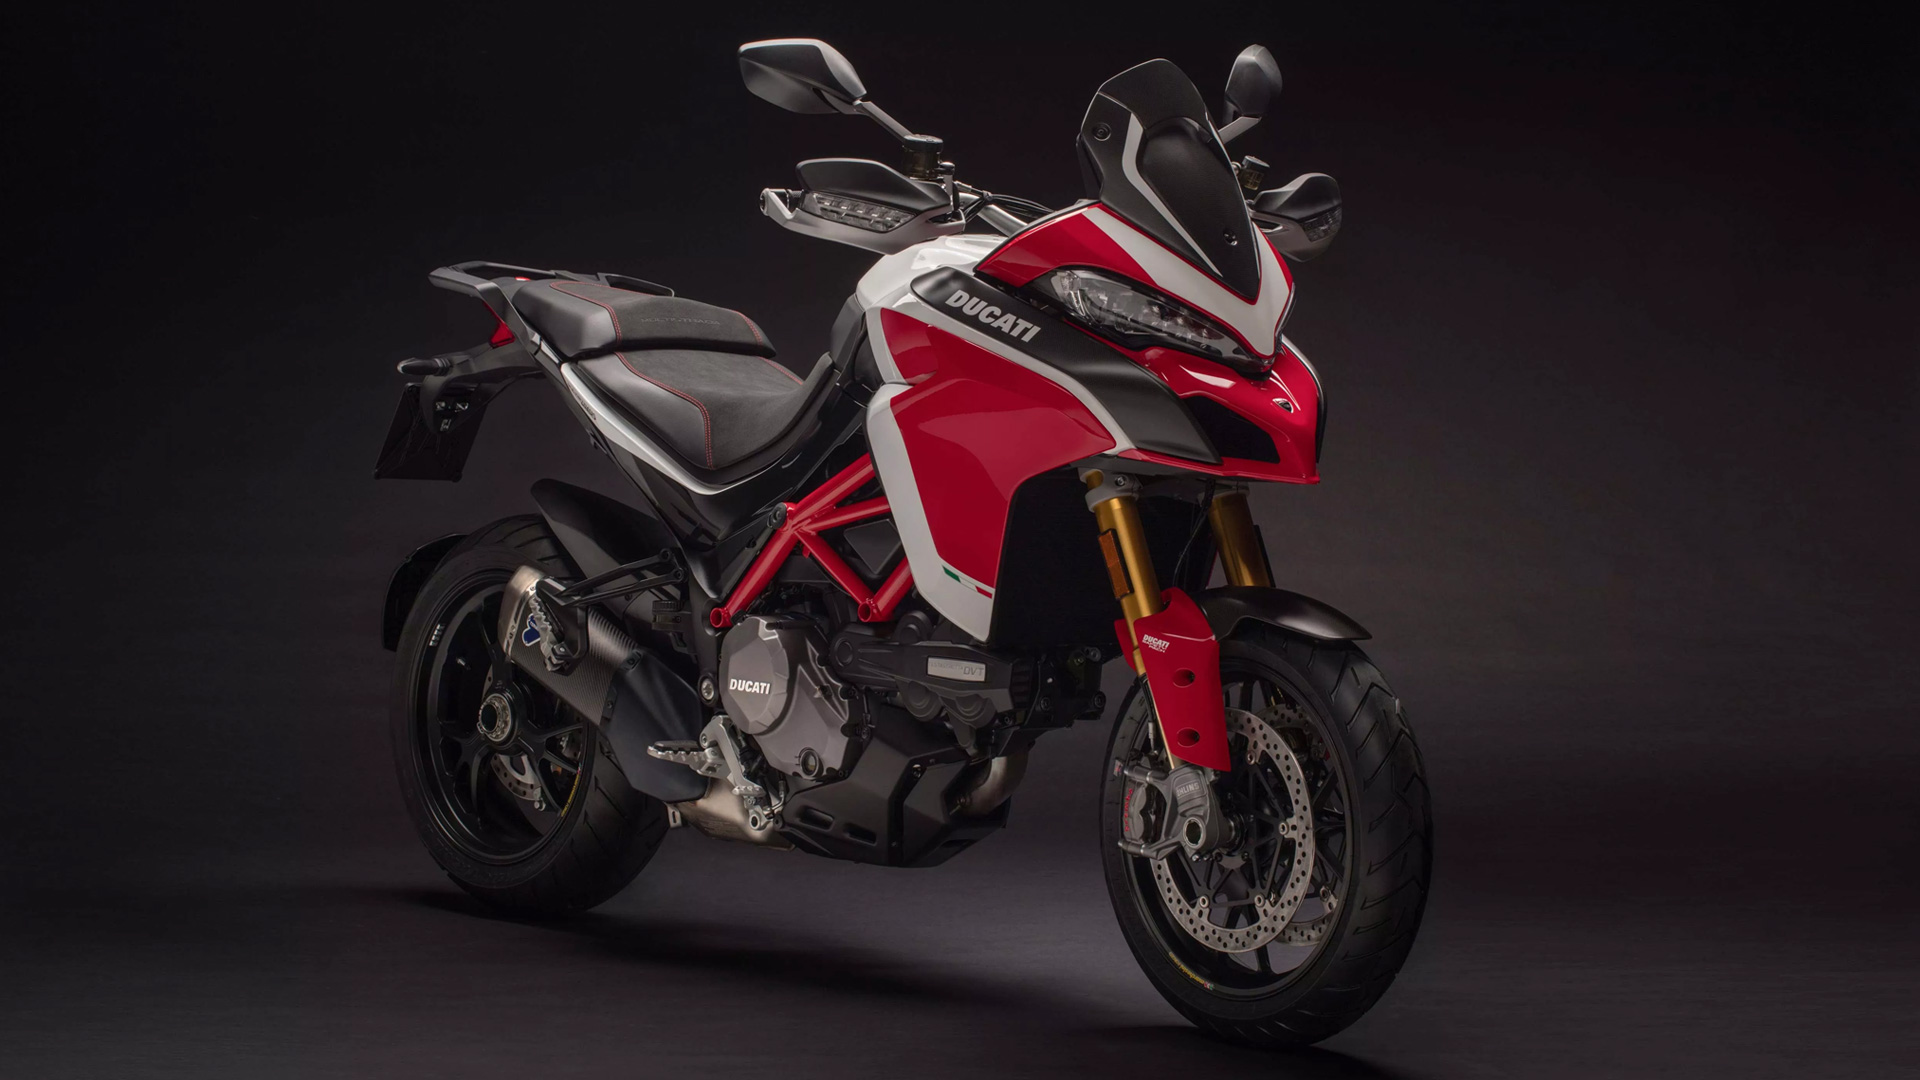 Ducati Multistrada 1260 Pikes Peak 2018 STD